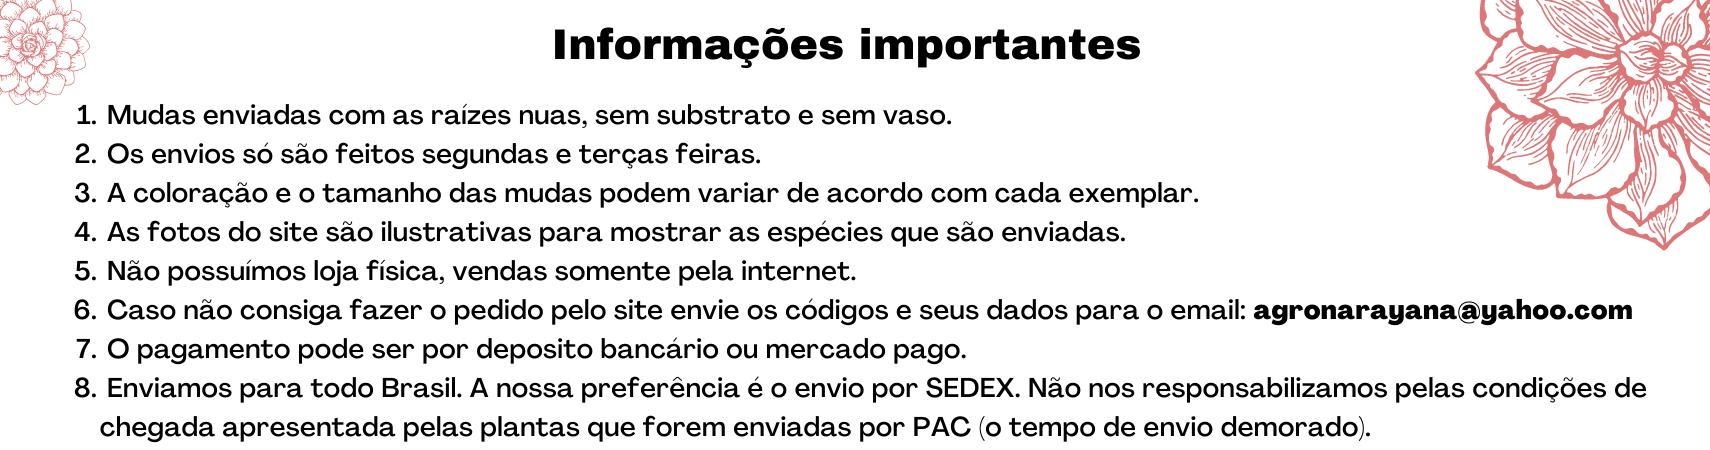 Informações 1